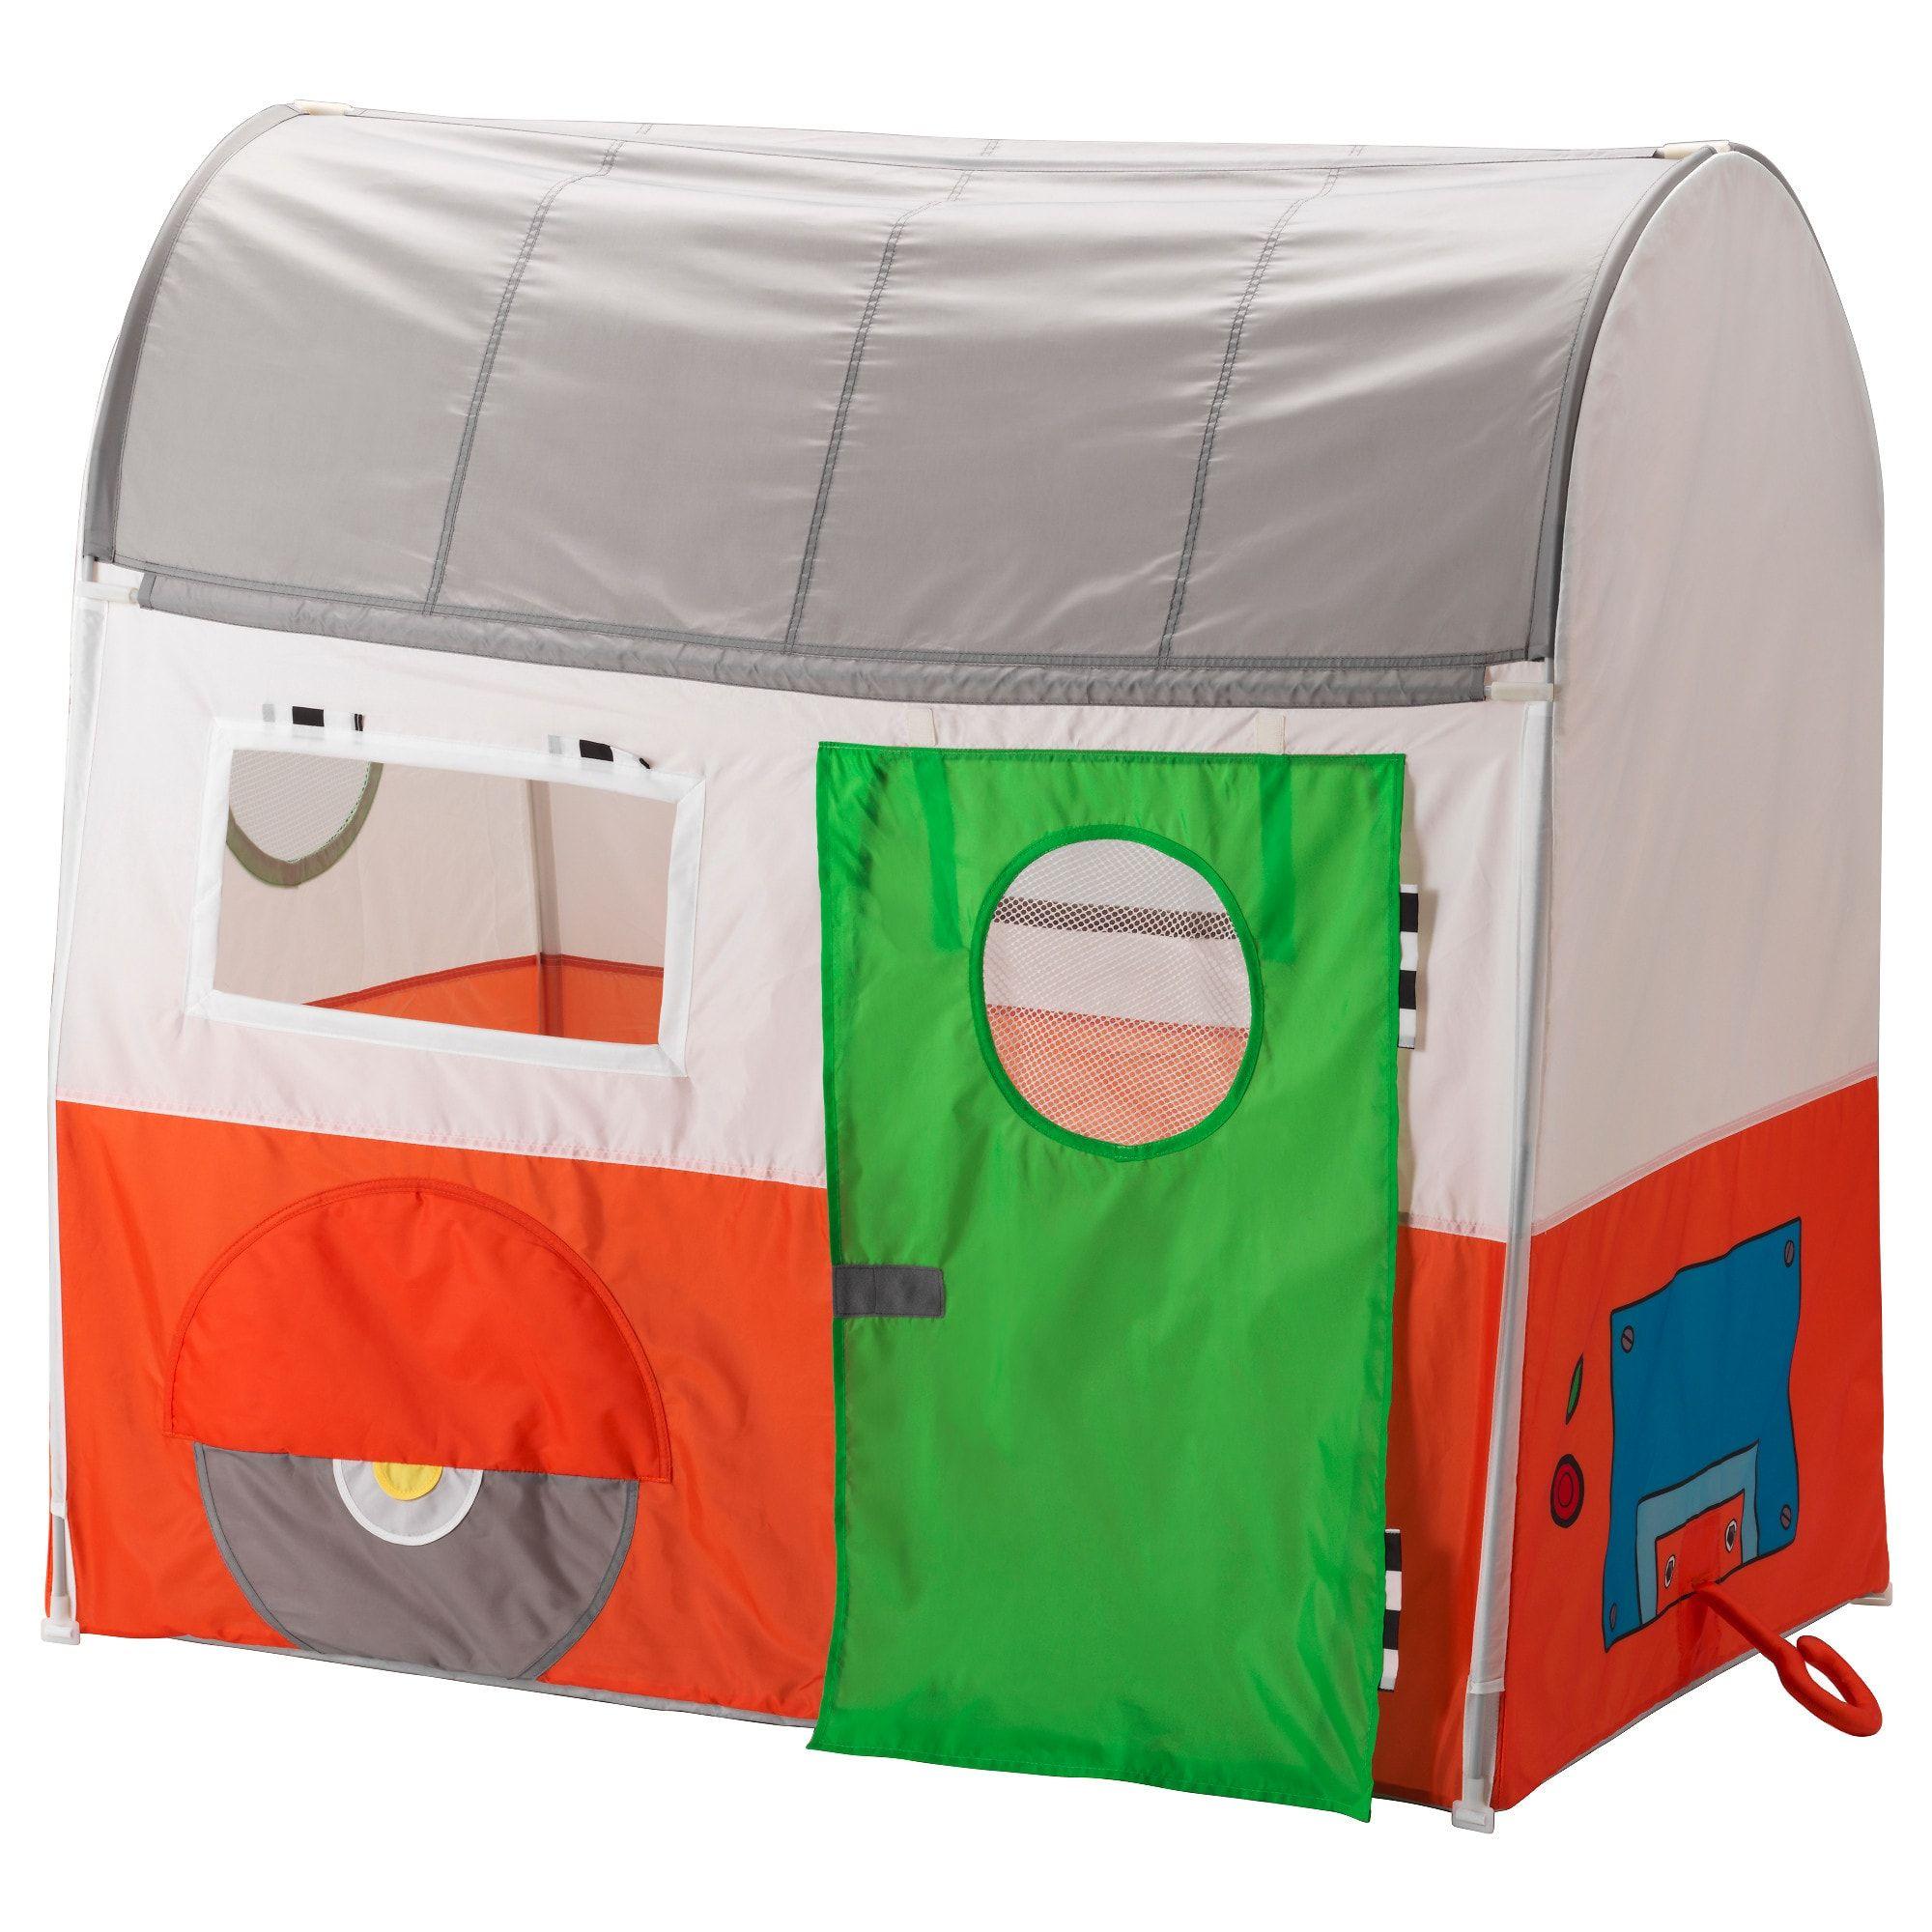 Hemmahos Children S Tent Caravan With Images Childrens Tent Tent Kids Tents